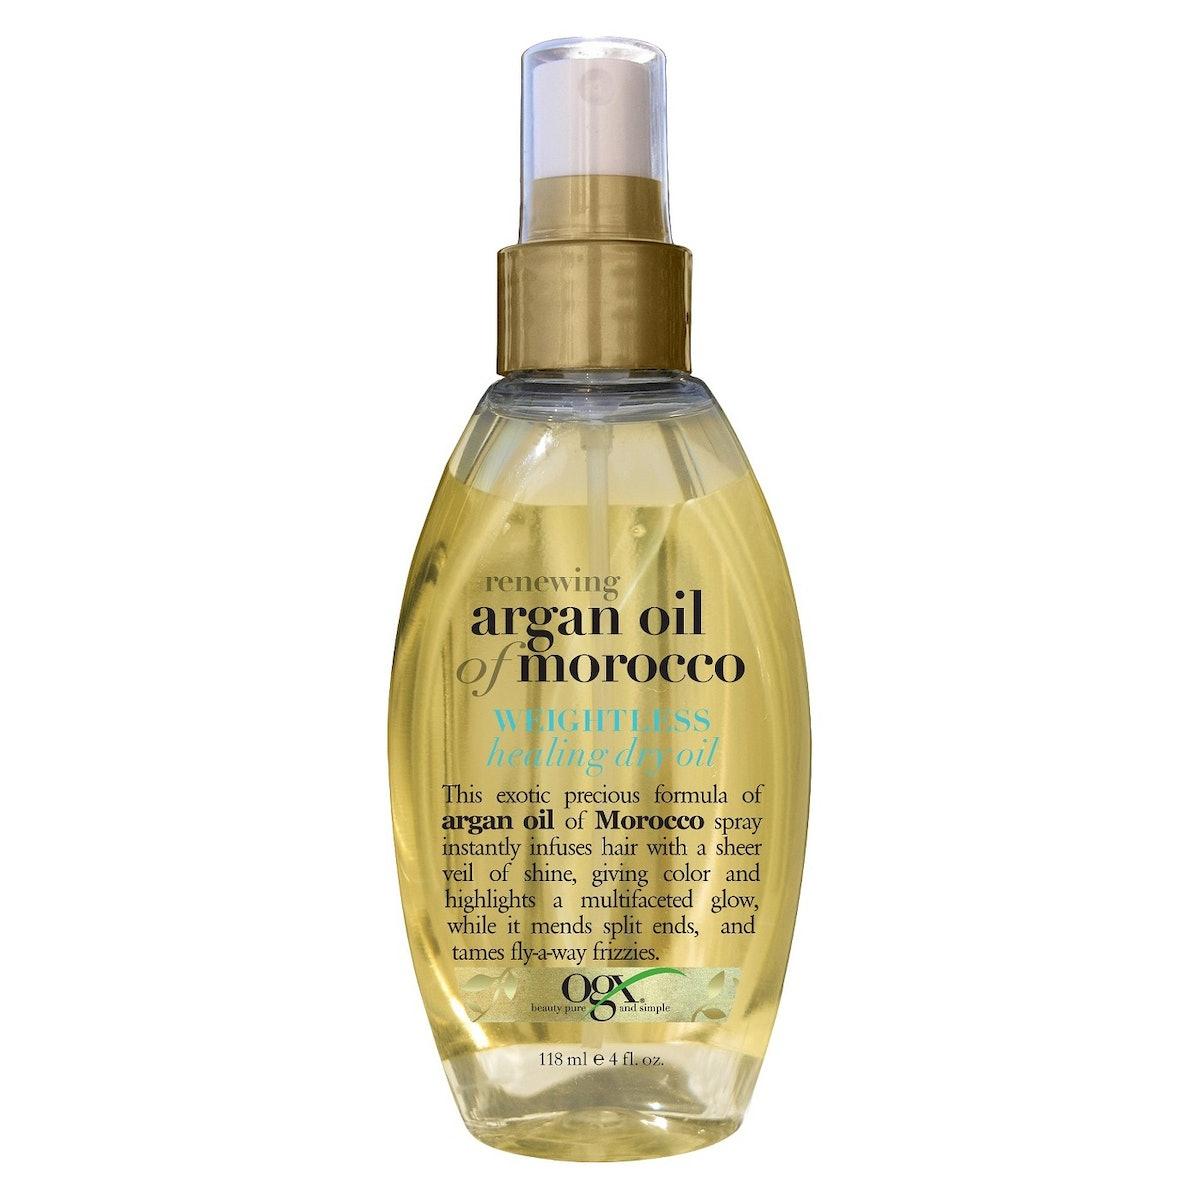 OGX Moroccan Argan Oil